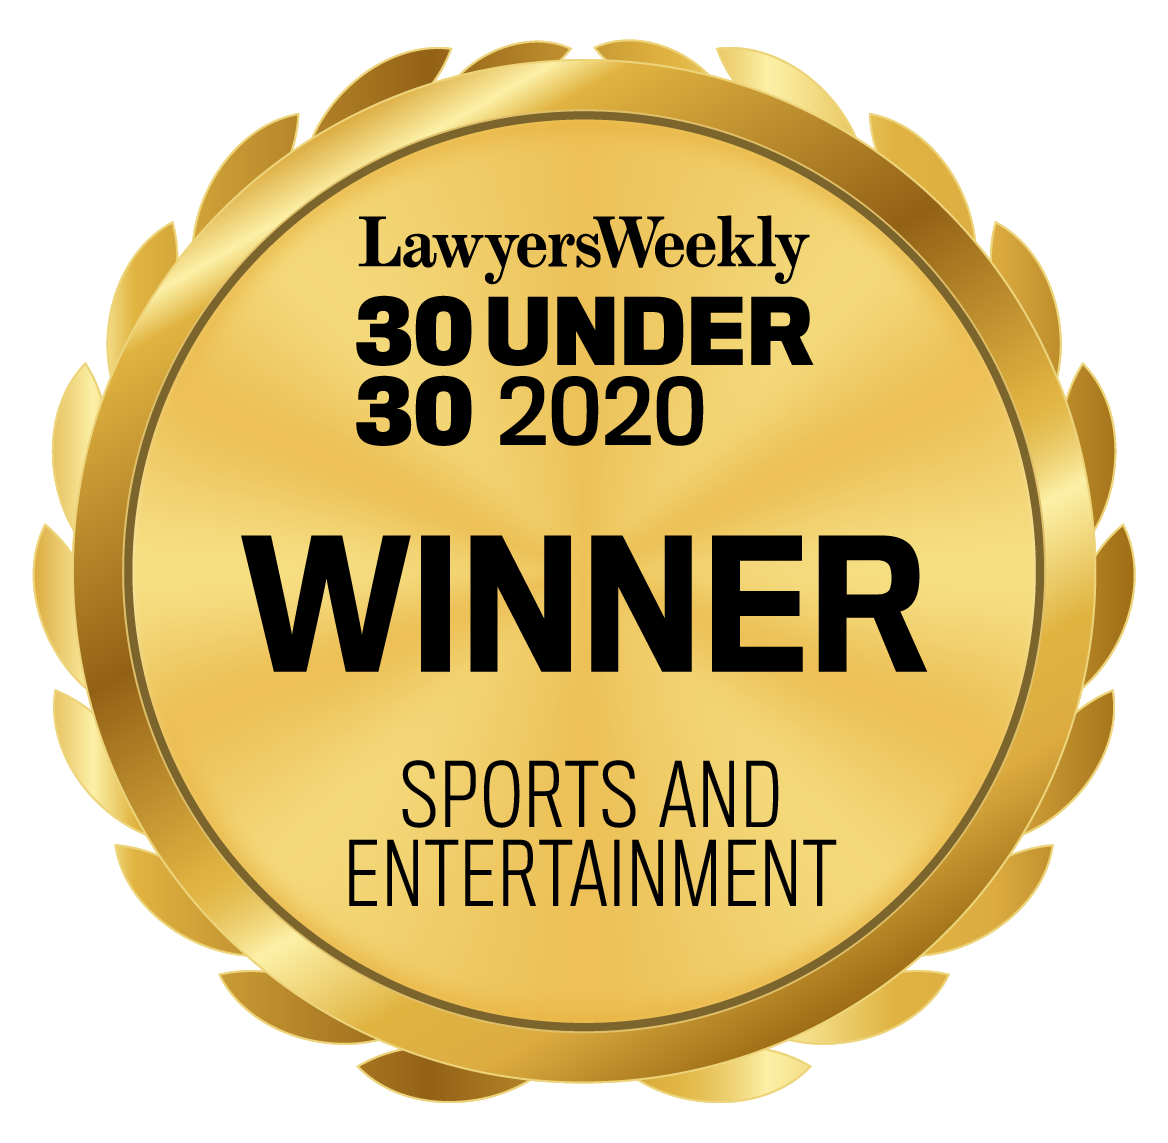 30U30_2020_Seal_Winner_Sports and Entertainment